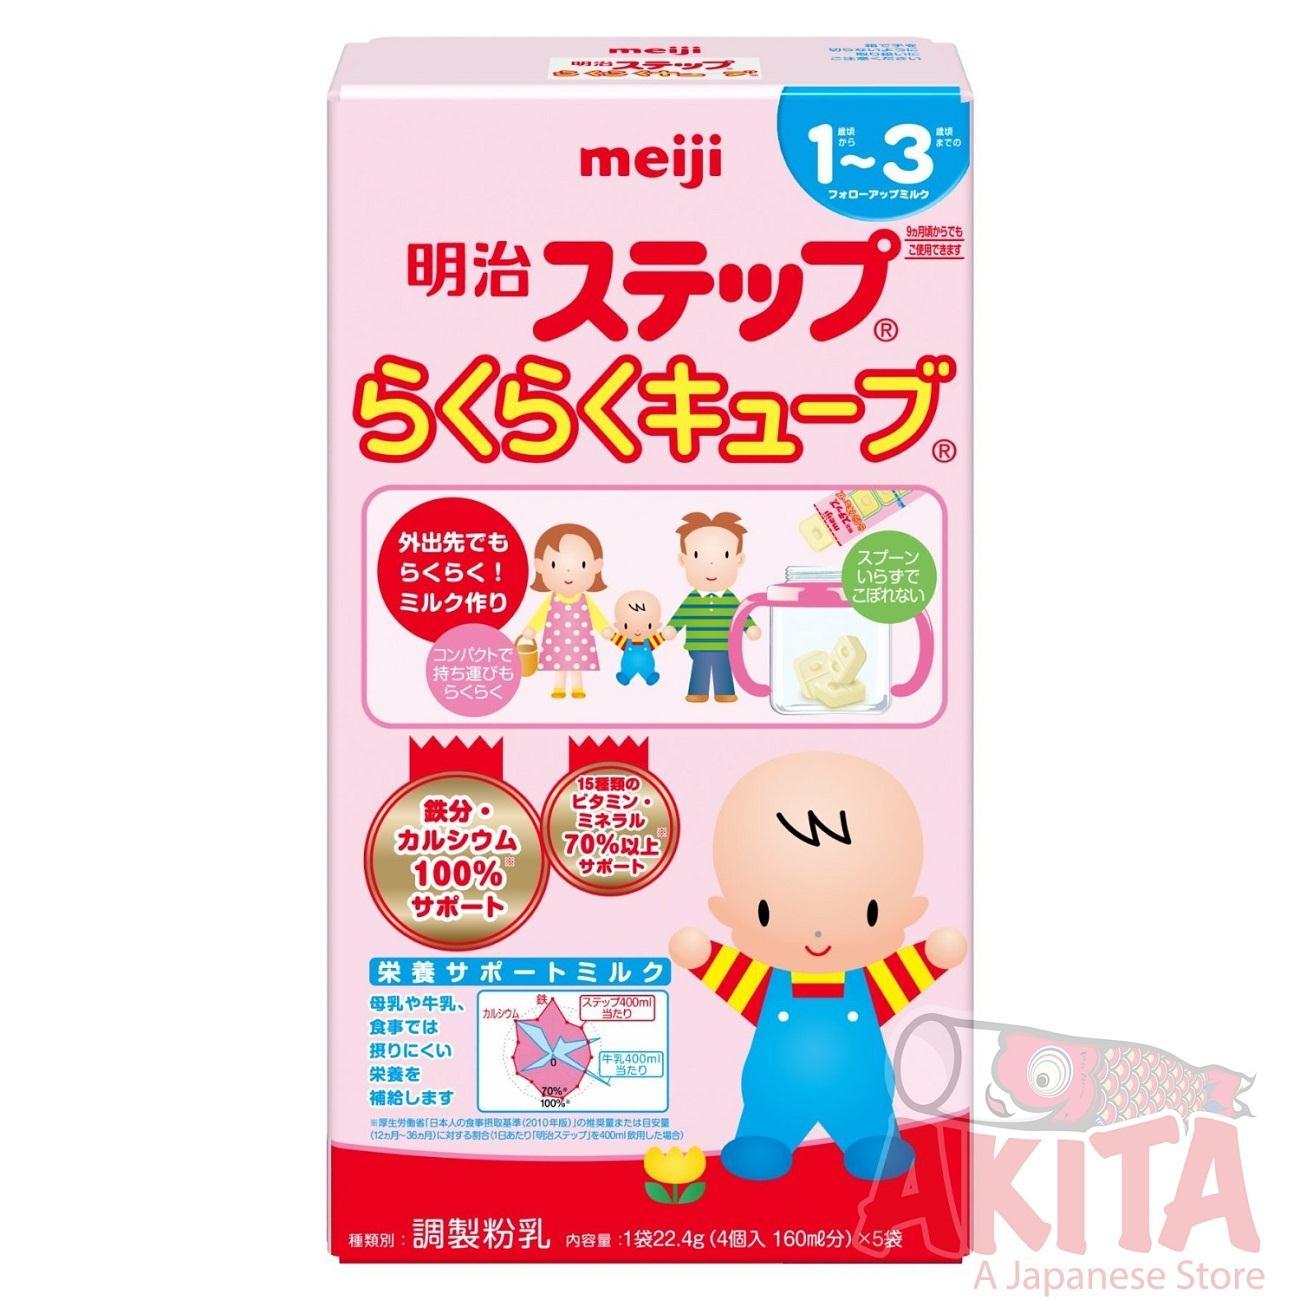 Sữa Meiji 1-3 (hộp 5 thanh)